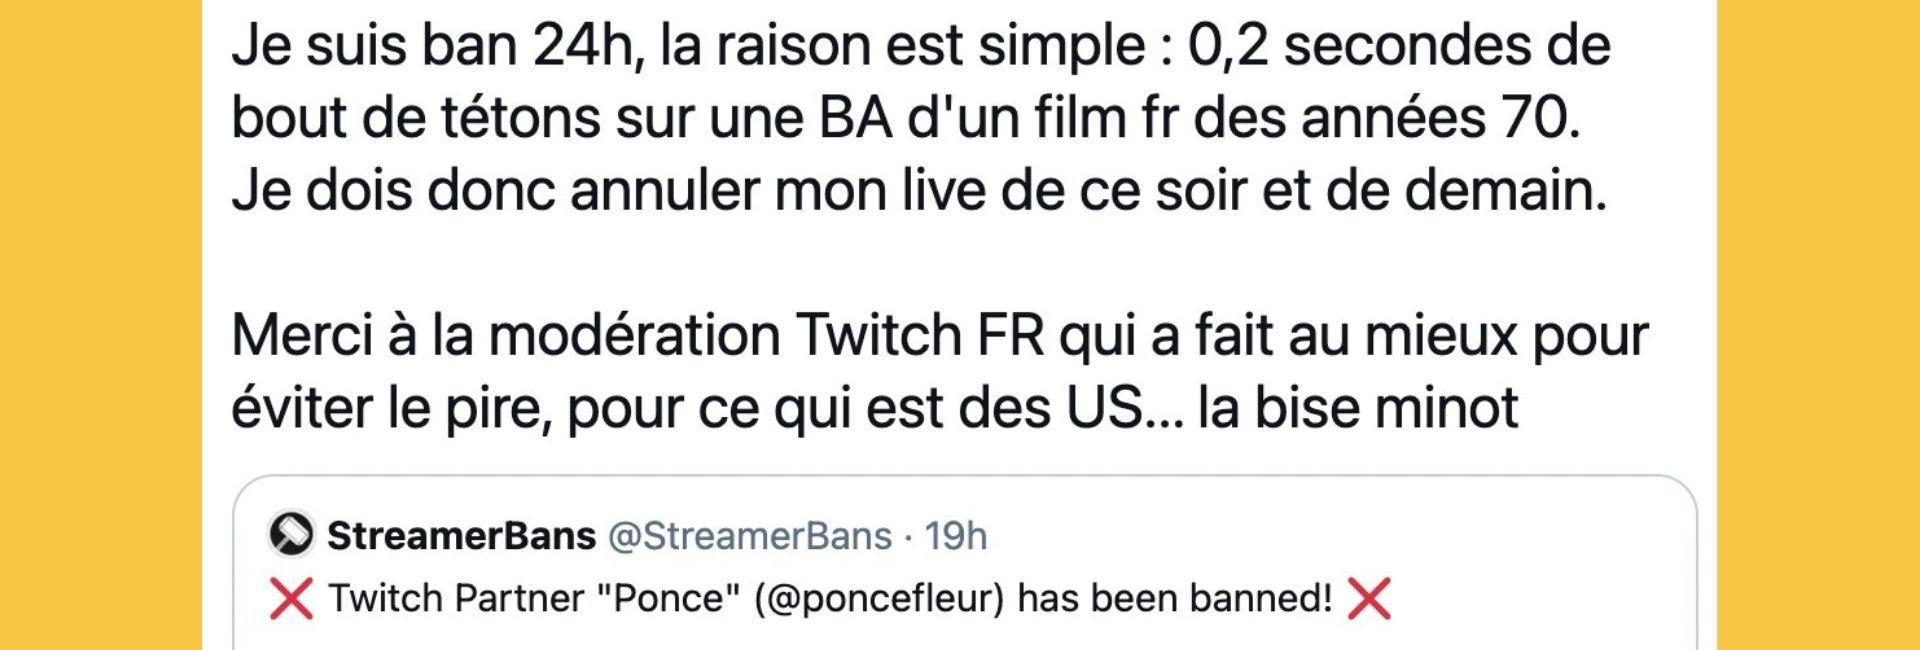 ponce-banni-twitch